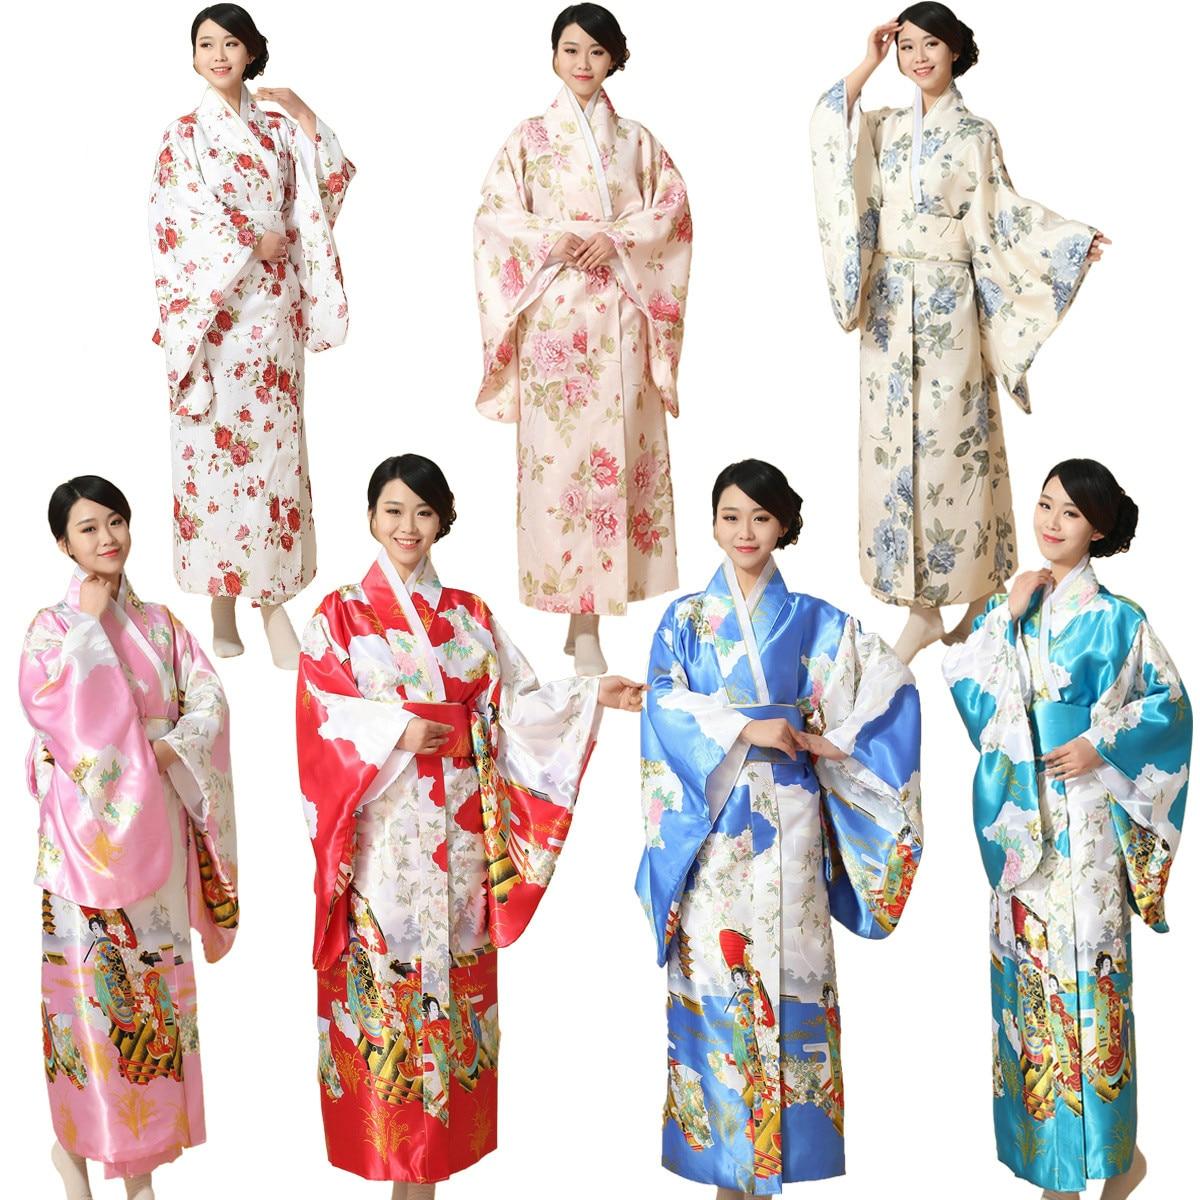 Women Japanese Traditional Costume Long Sleeve Bathrobe Female Japanese Kimono Adult National Costume Yukata Party Cosplay 18